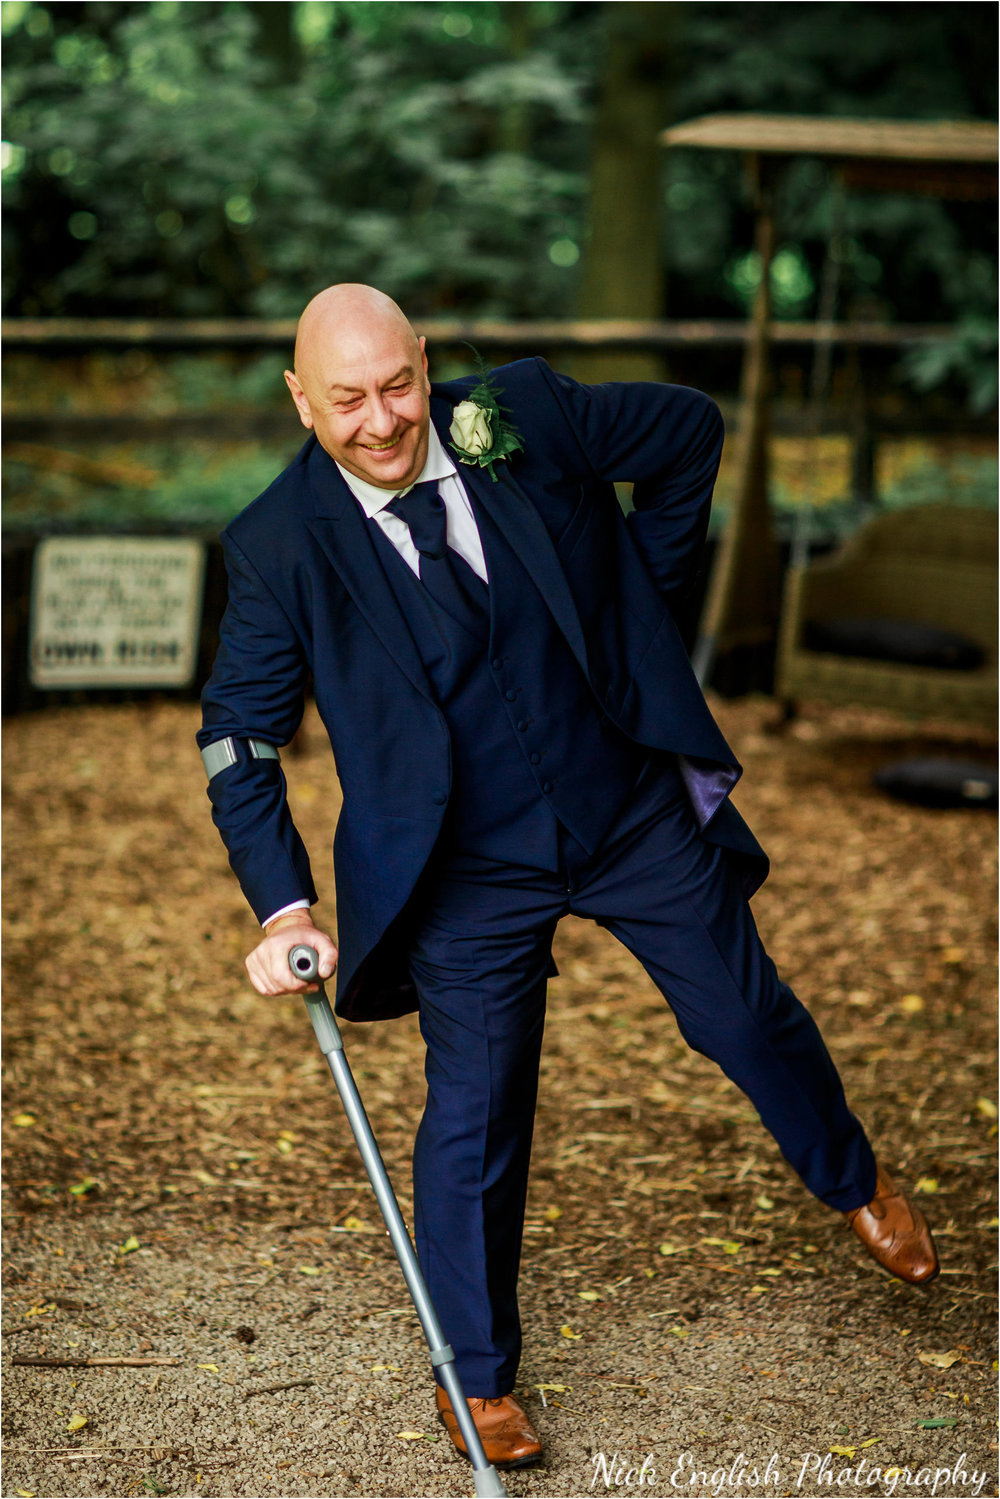 Bartle Hall Wedding Photographs Preston Lancashire 144.jpg